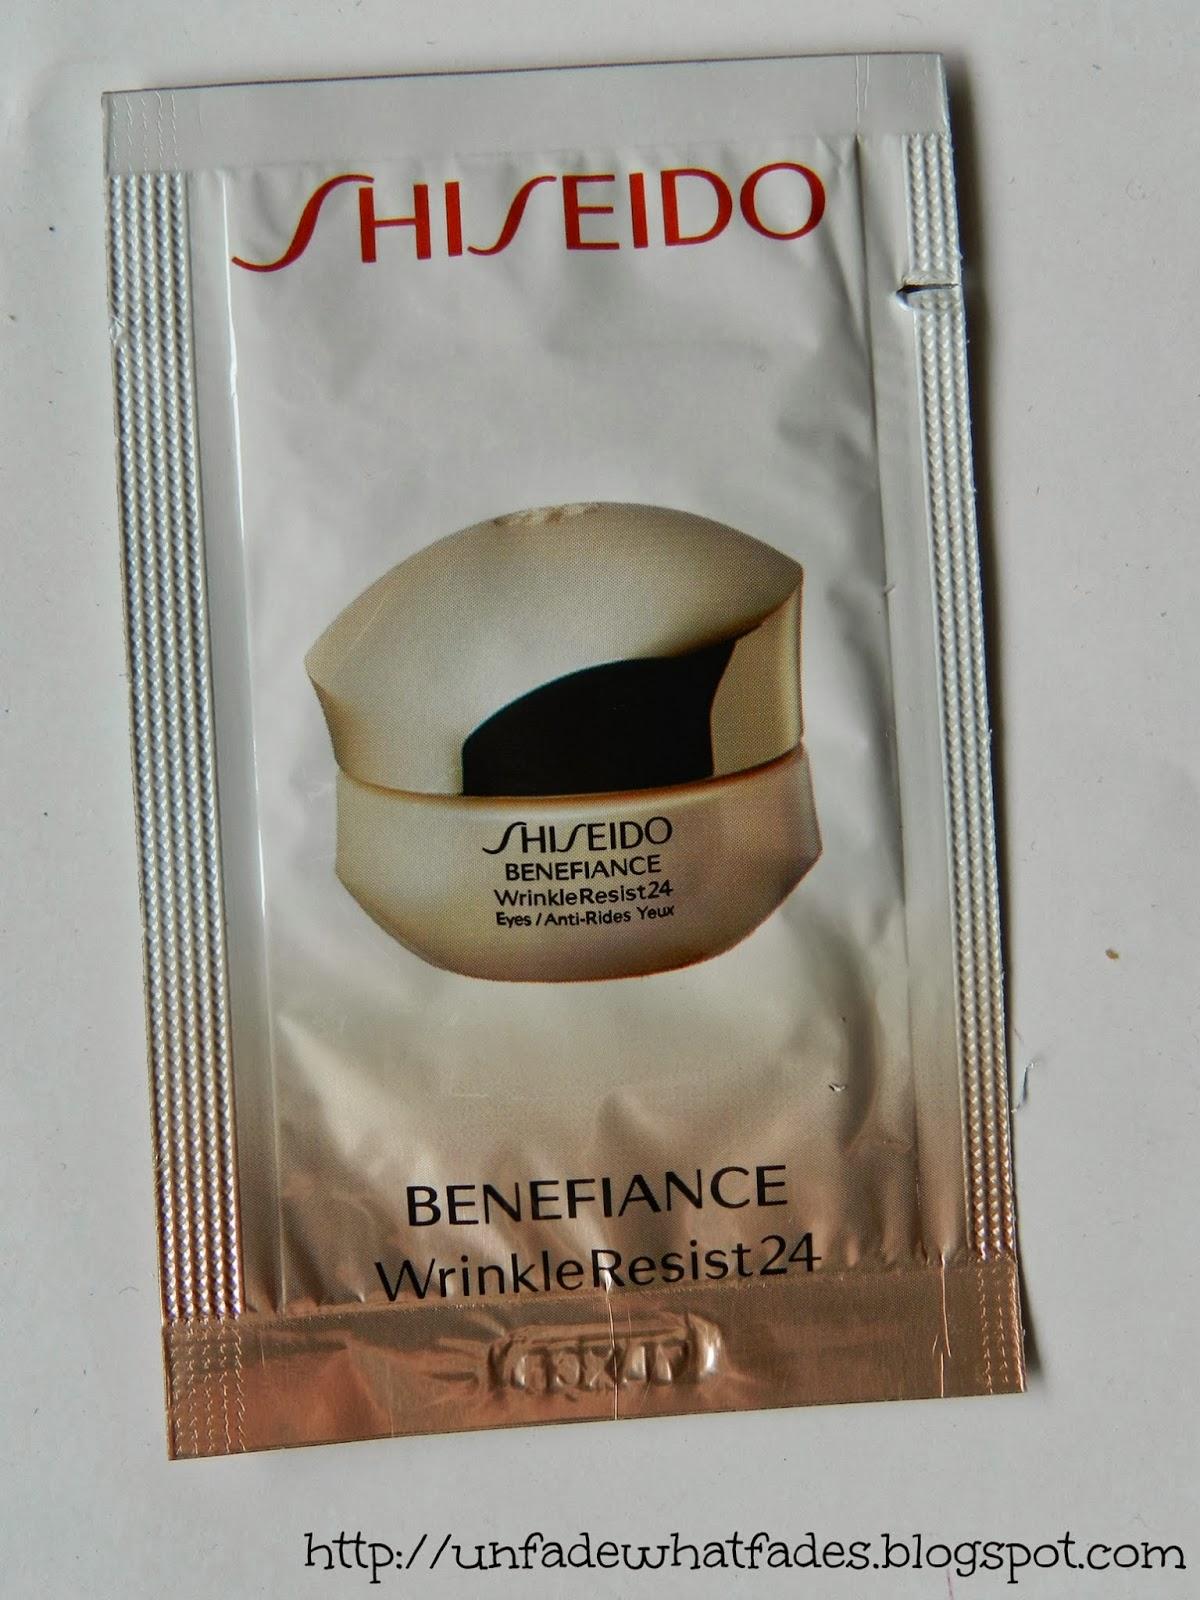 unfade what fades shiseido bio performance super corrective eye cream and benefiance wrinkle. Black Bedroom Furniture Sets. Home Design Ideas